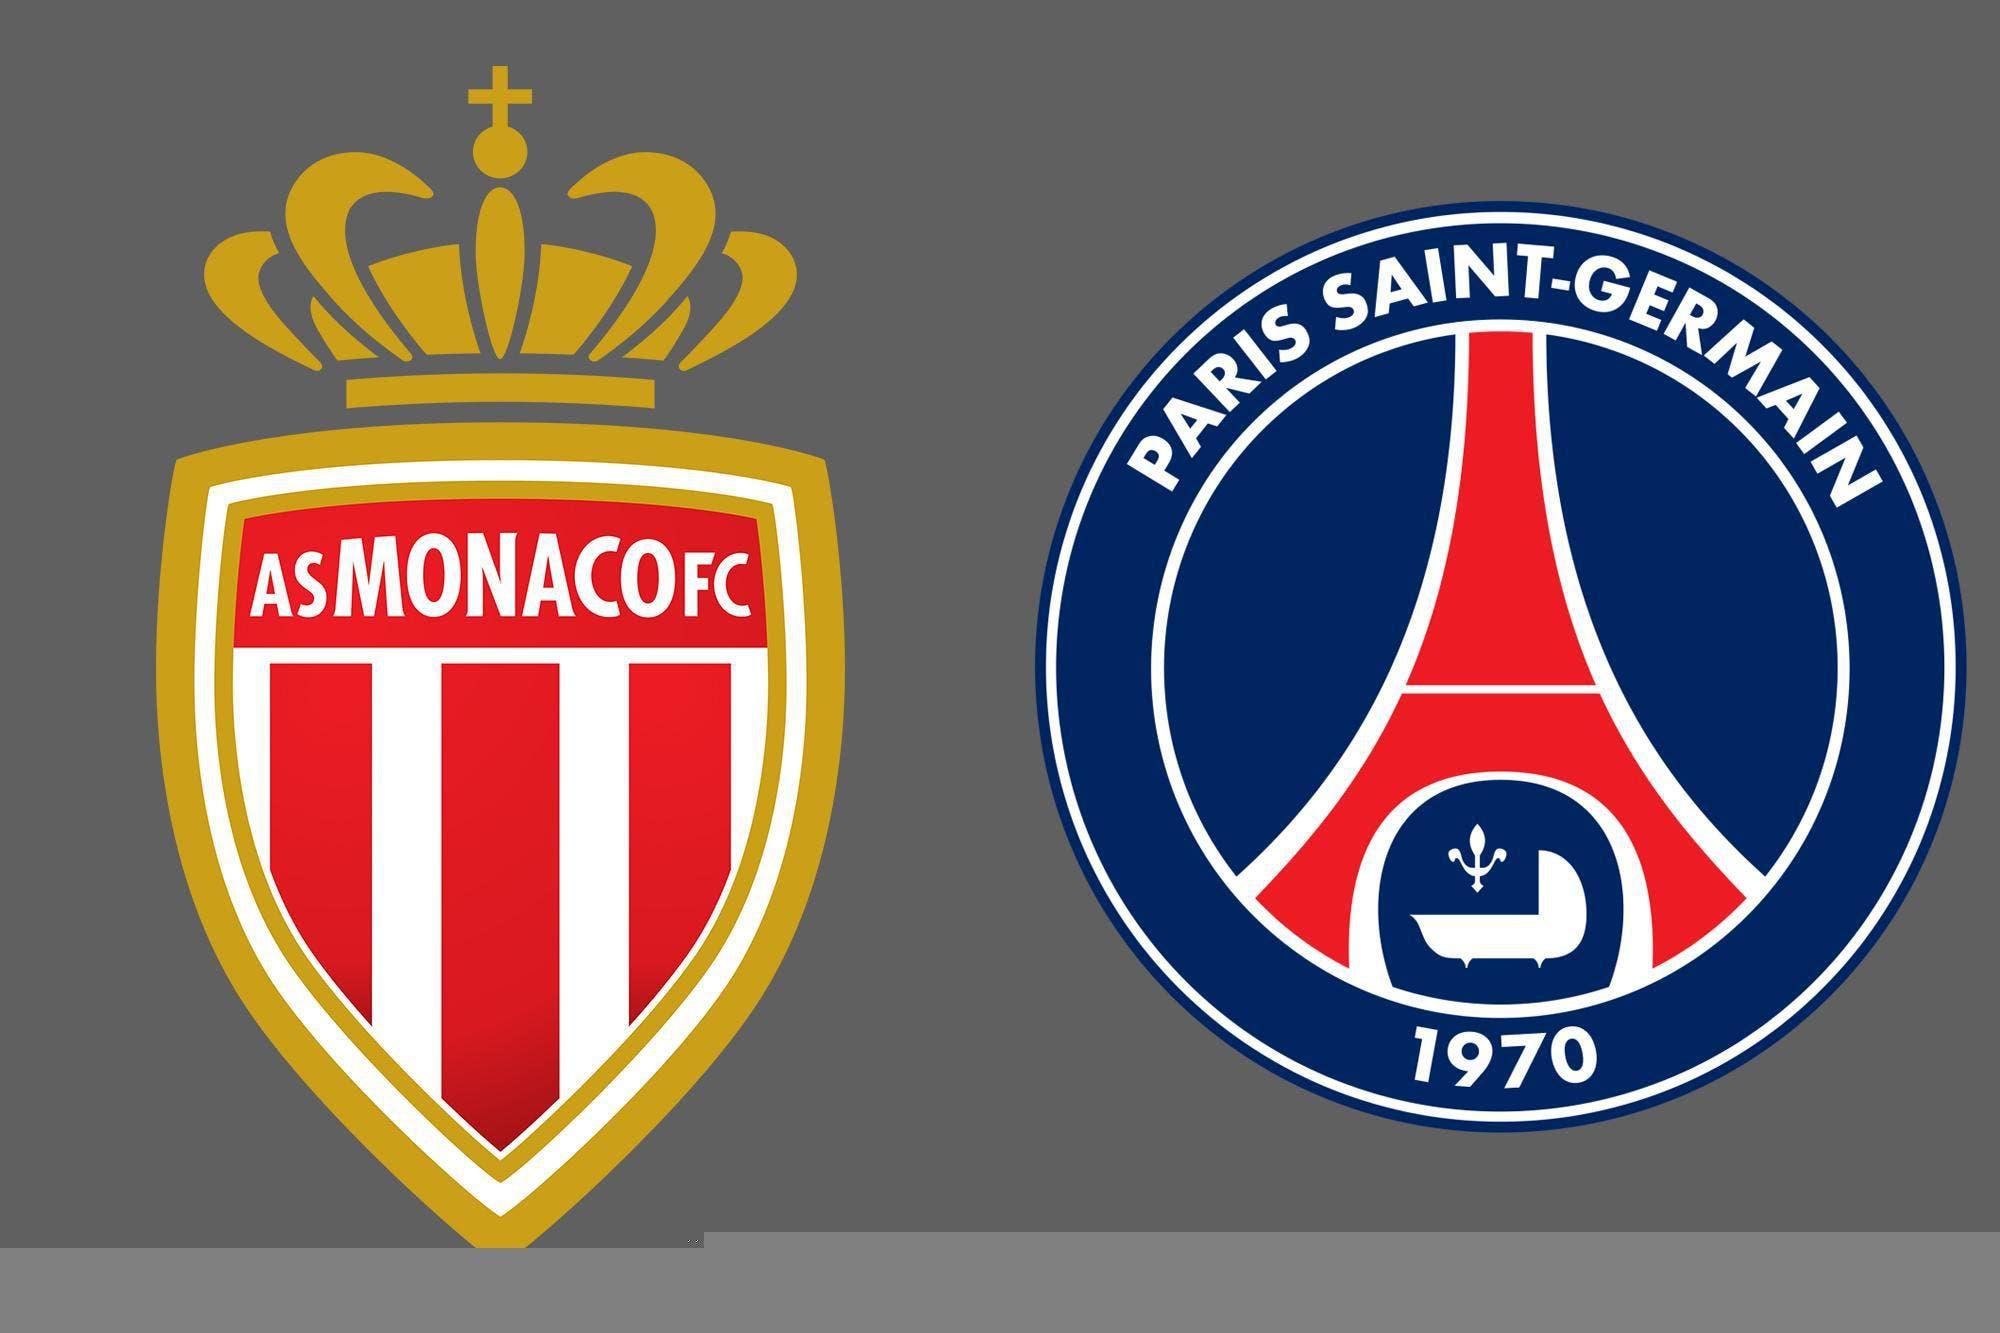 Ligue 1 de Francia: Monaco venció por 3-2 a PSG como local